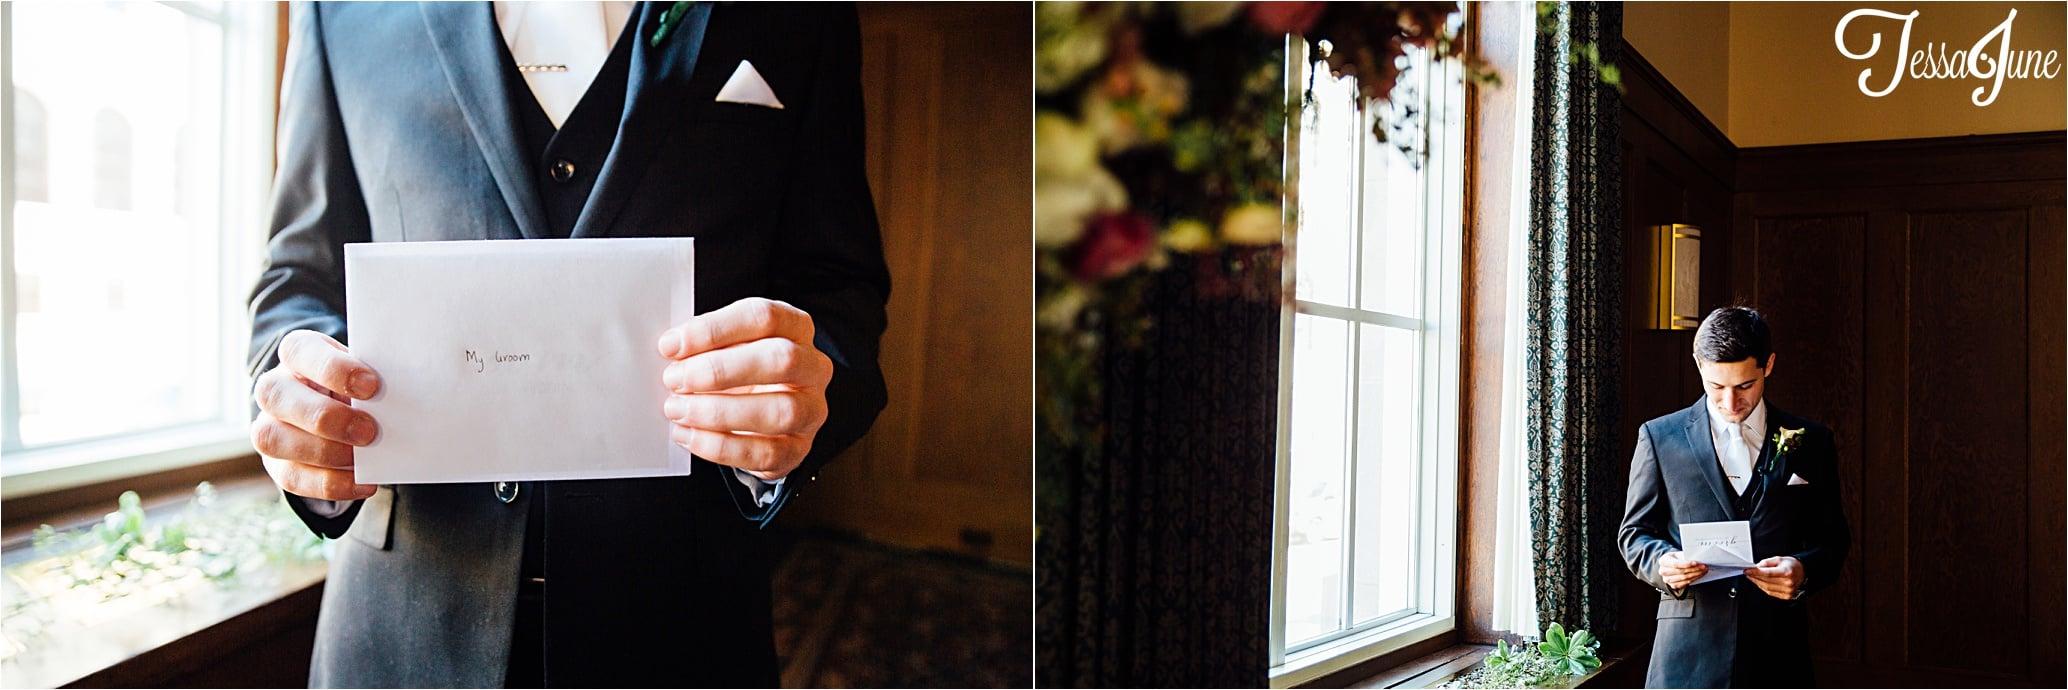 st-cloud-minnesota-wedding-photographer-rice-park-winter-maroon